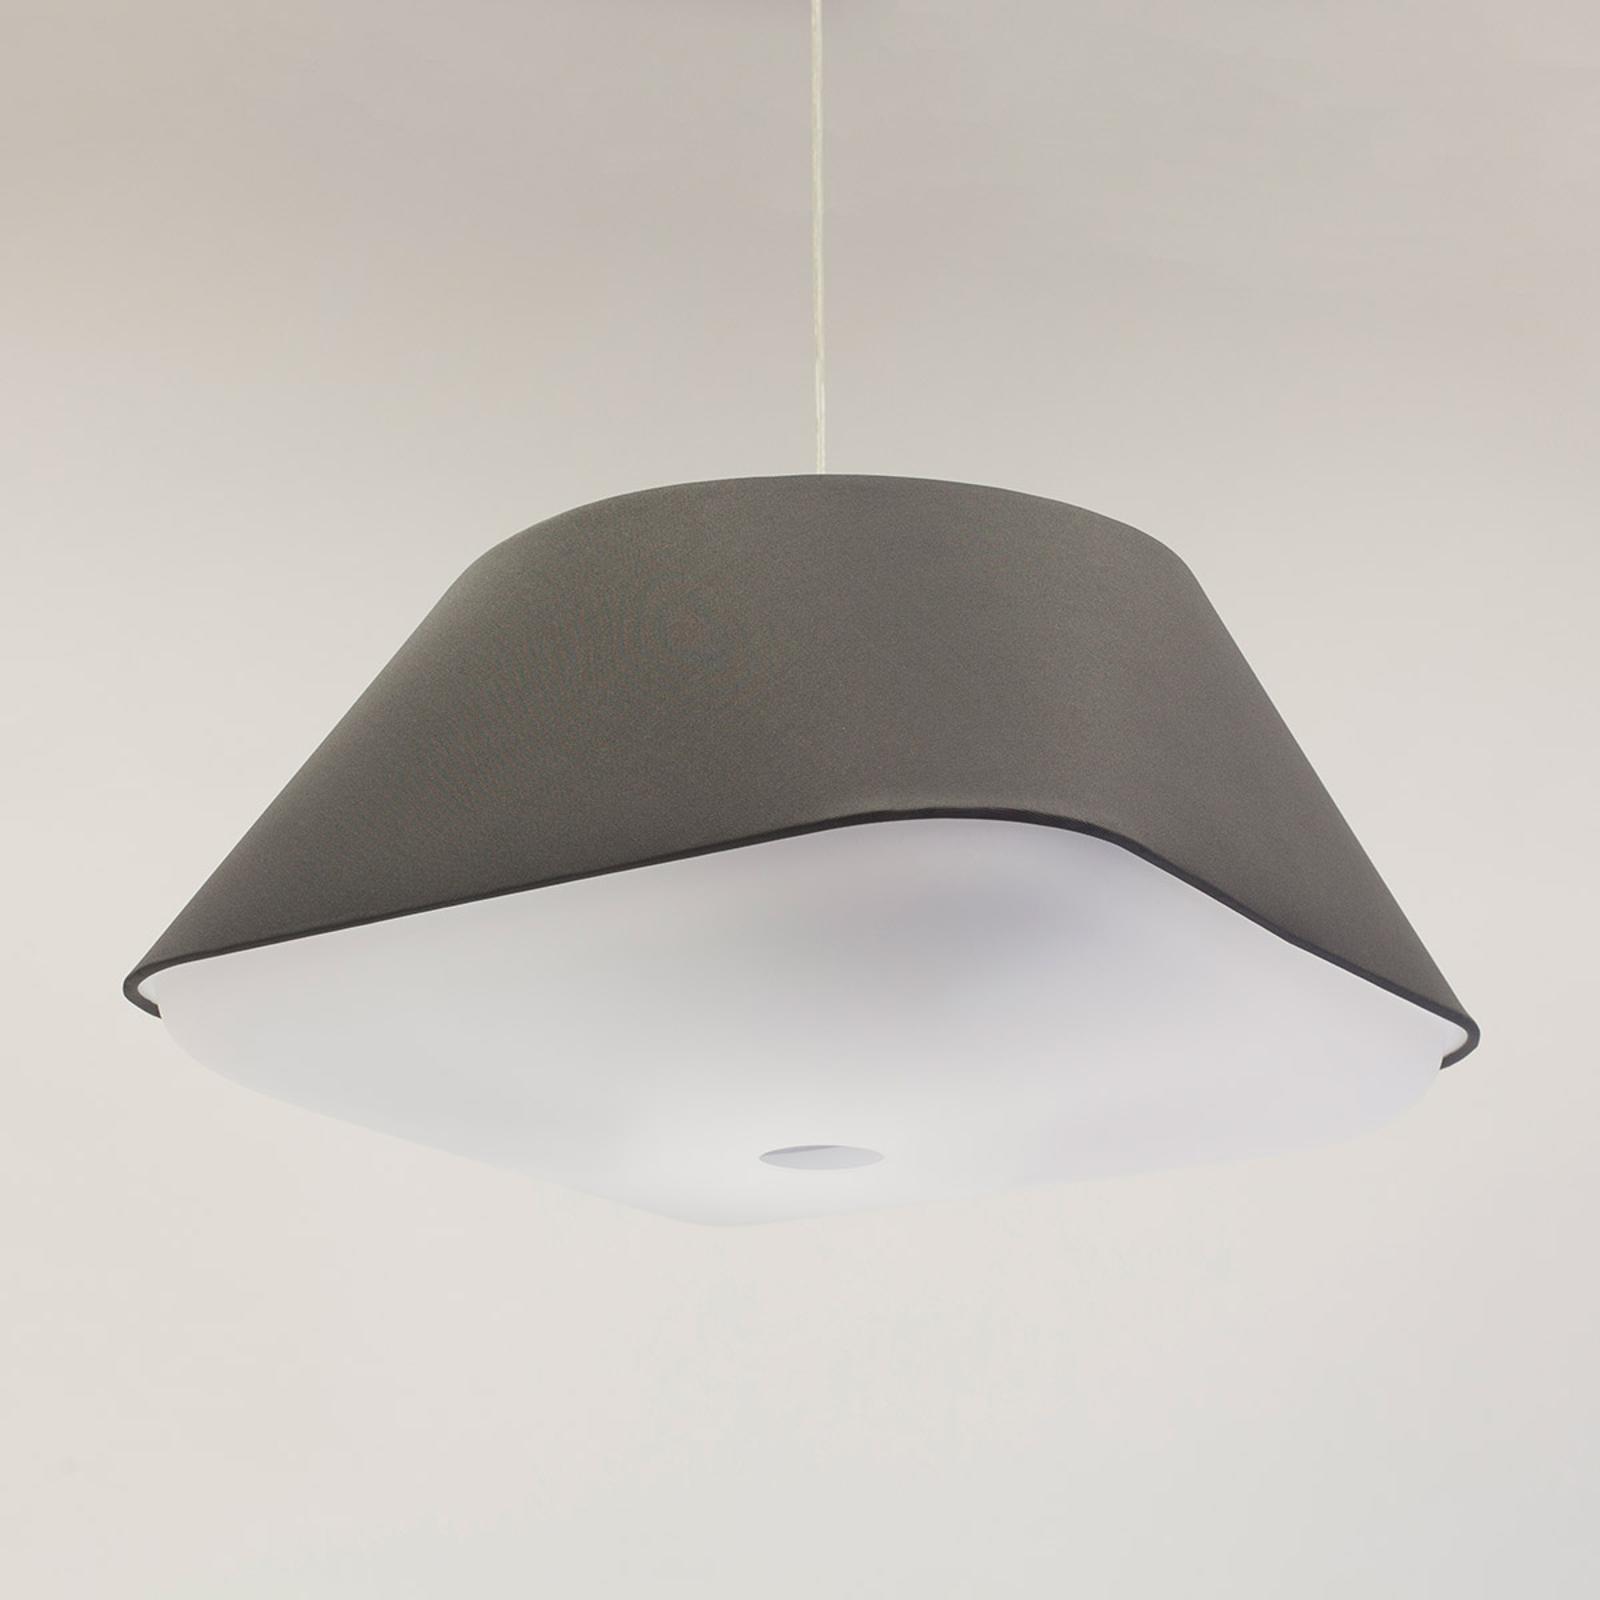 Innermost RD2SQ 60 - textiel-hanglamp, donkergrijs